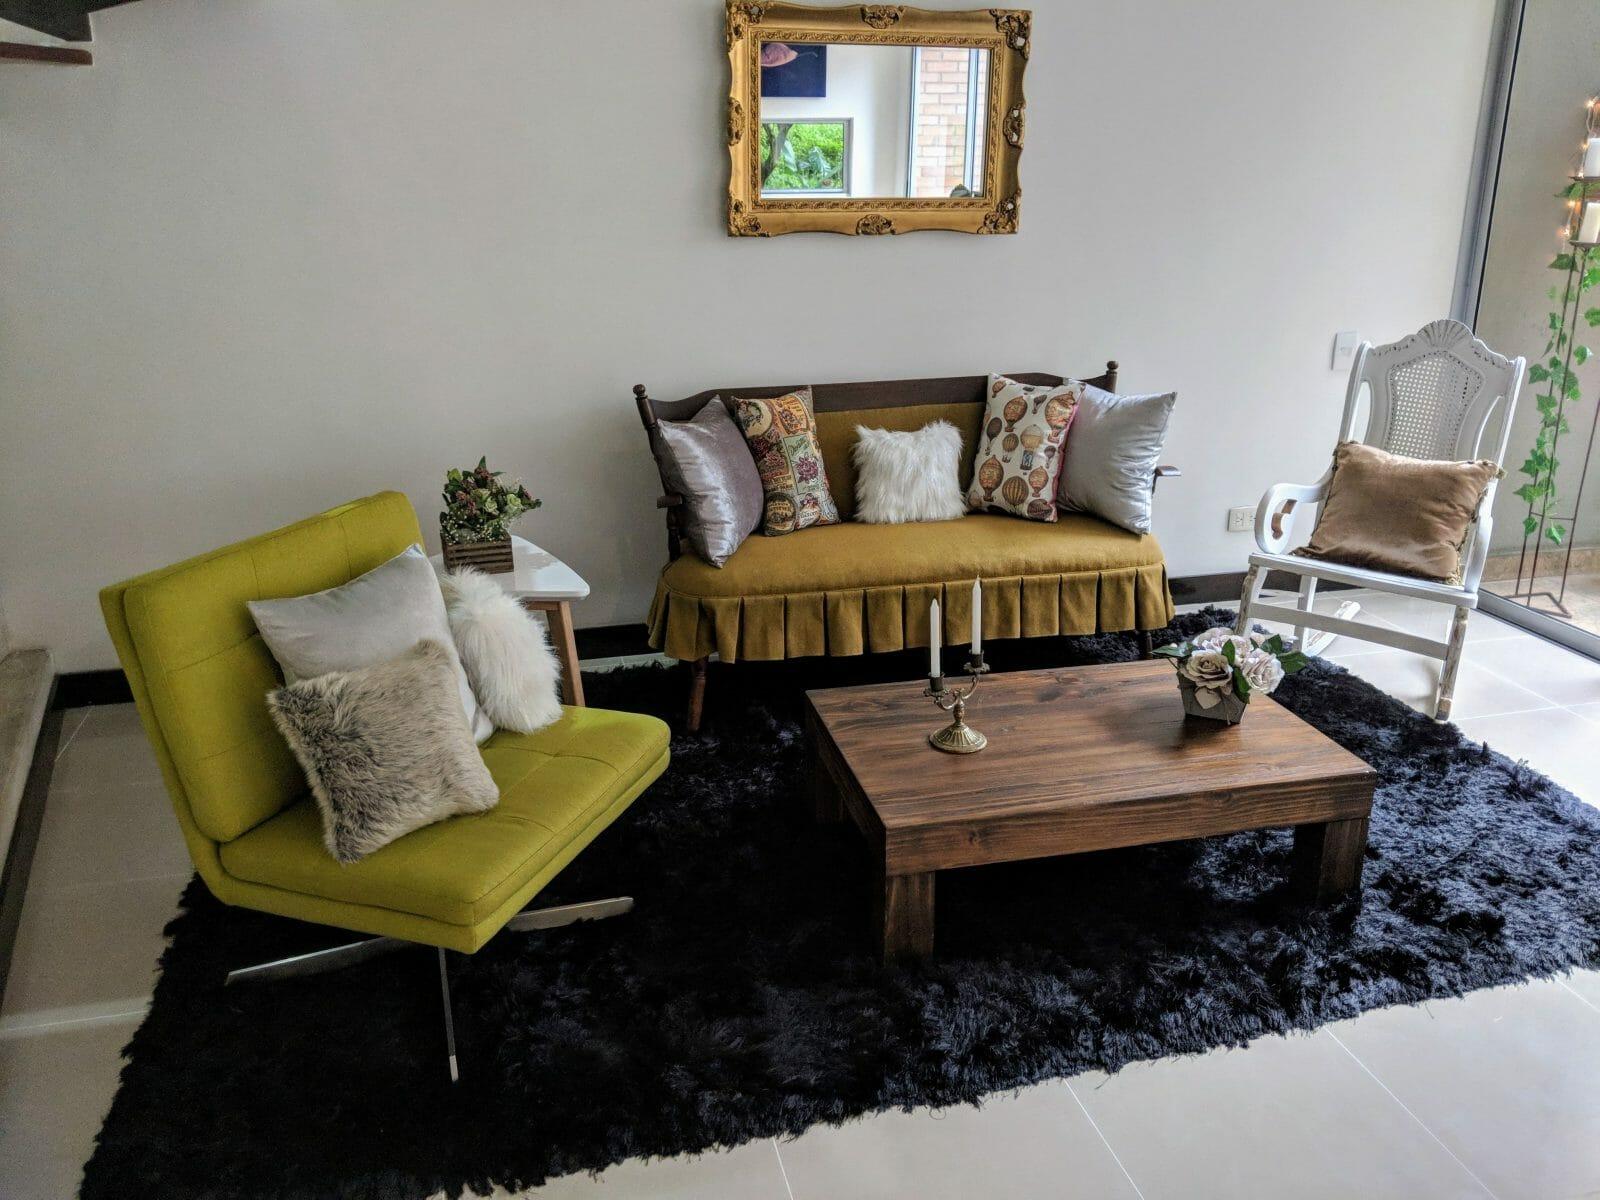 Airbnb Superhost Checklist - OptimizeMyBnb com